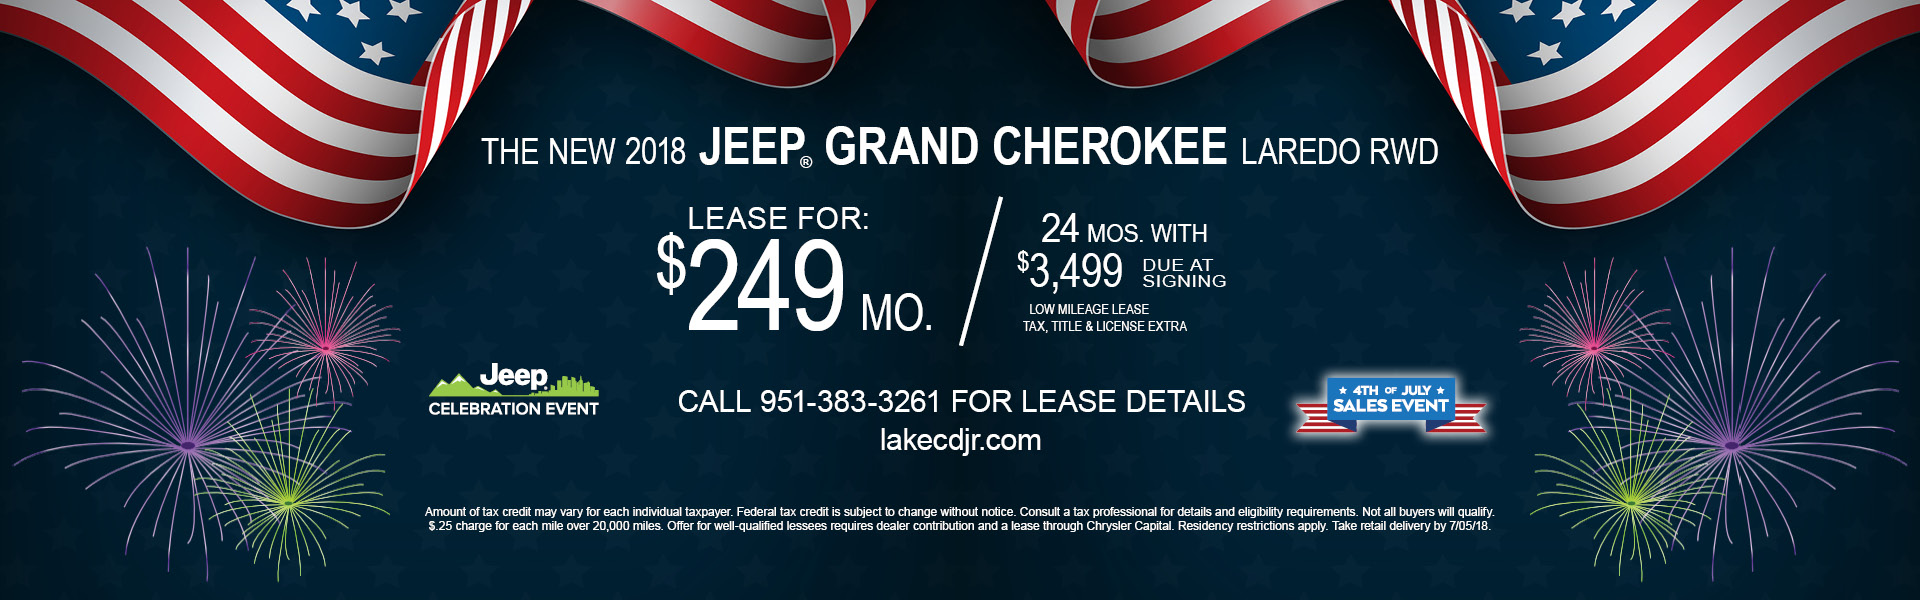 Jeep Grand Cherokee Laredo $249 Lease